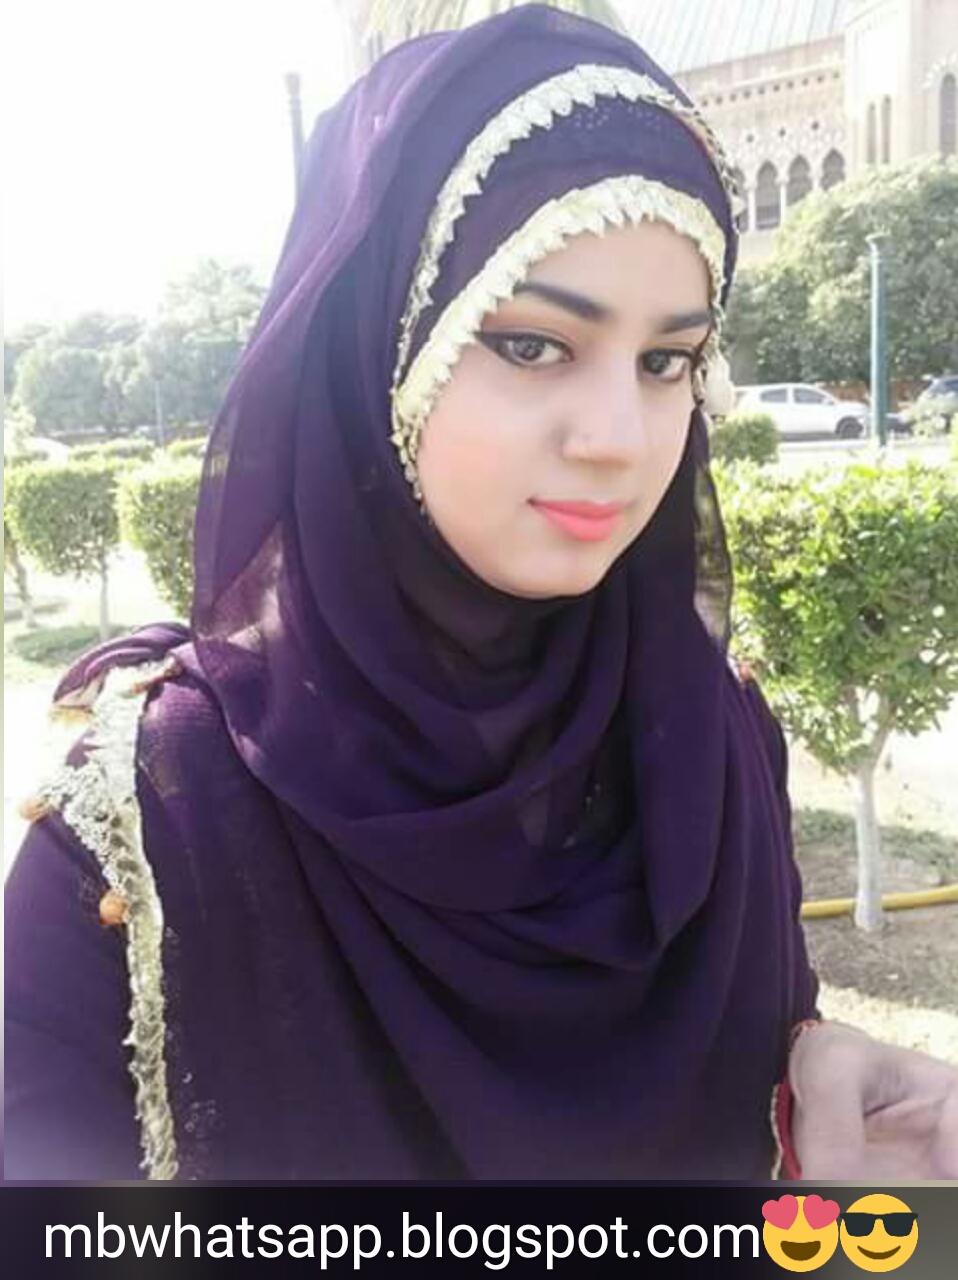 occupation student address karachi gulshan iqbal city state karachi country pakistan whatsapp mobile number 923467199732